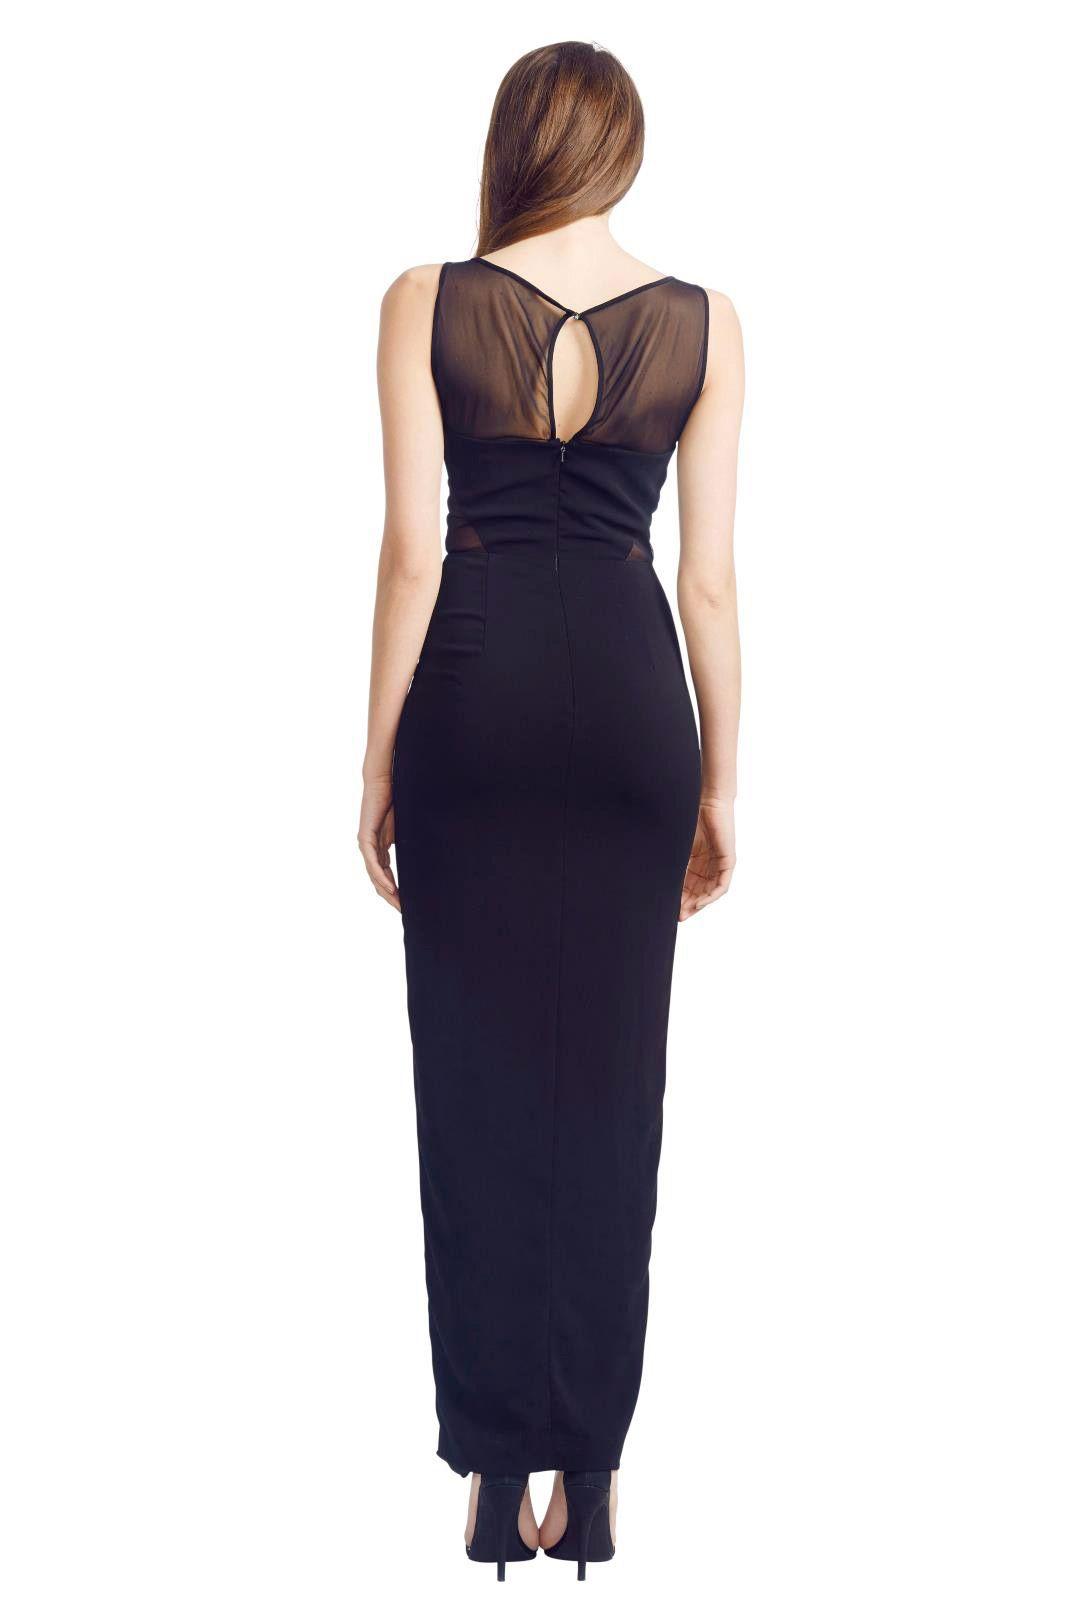 Badgley Mischka - Panel Gown - Black - Back